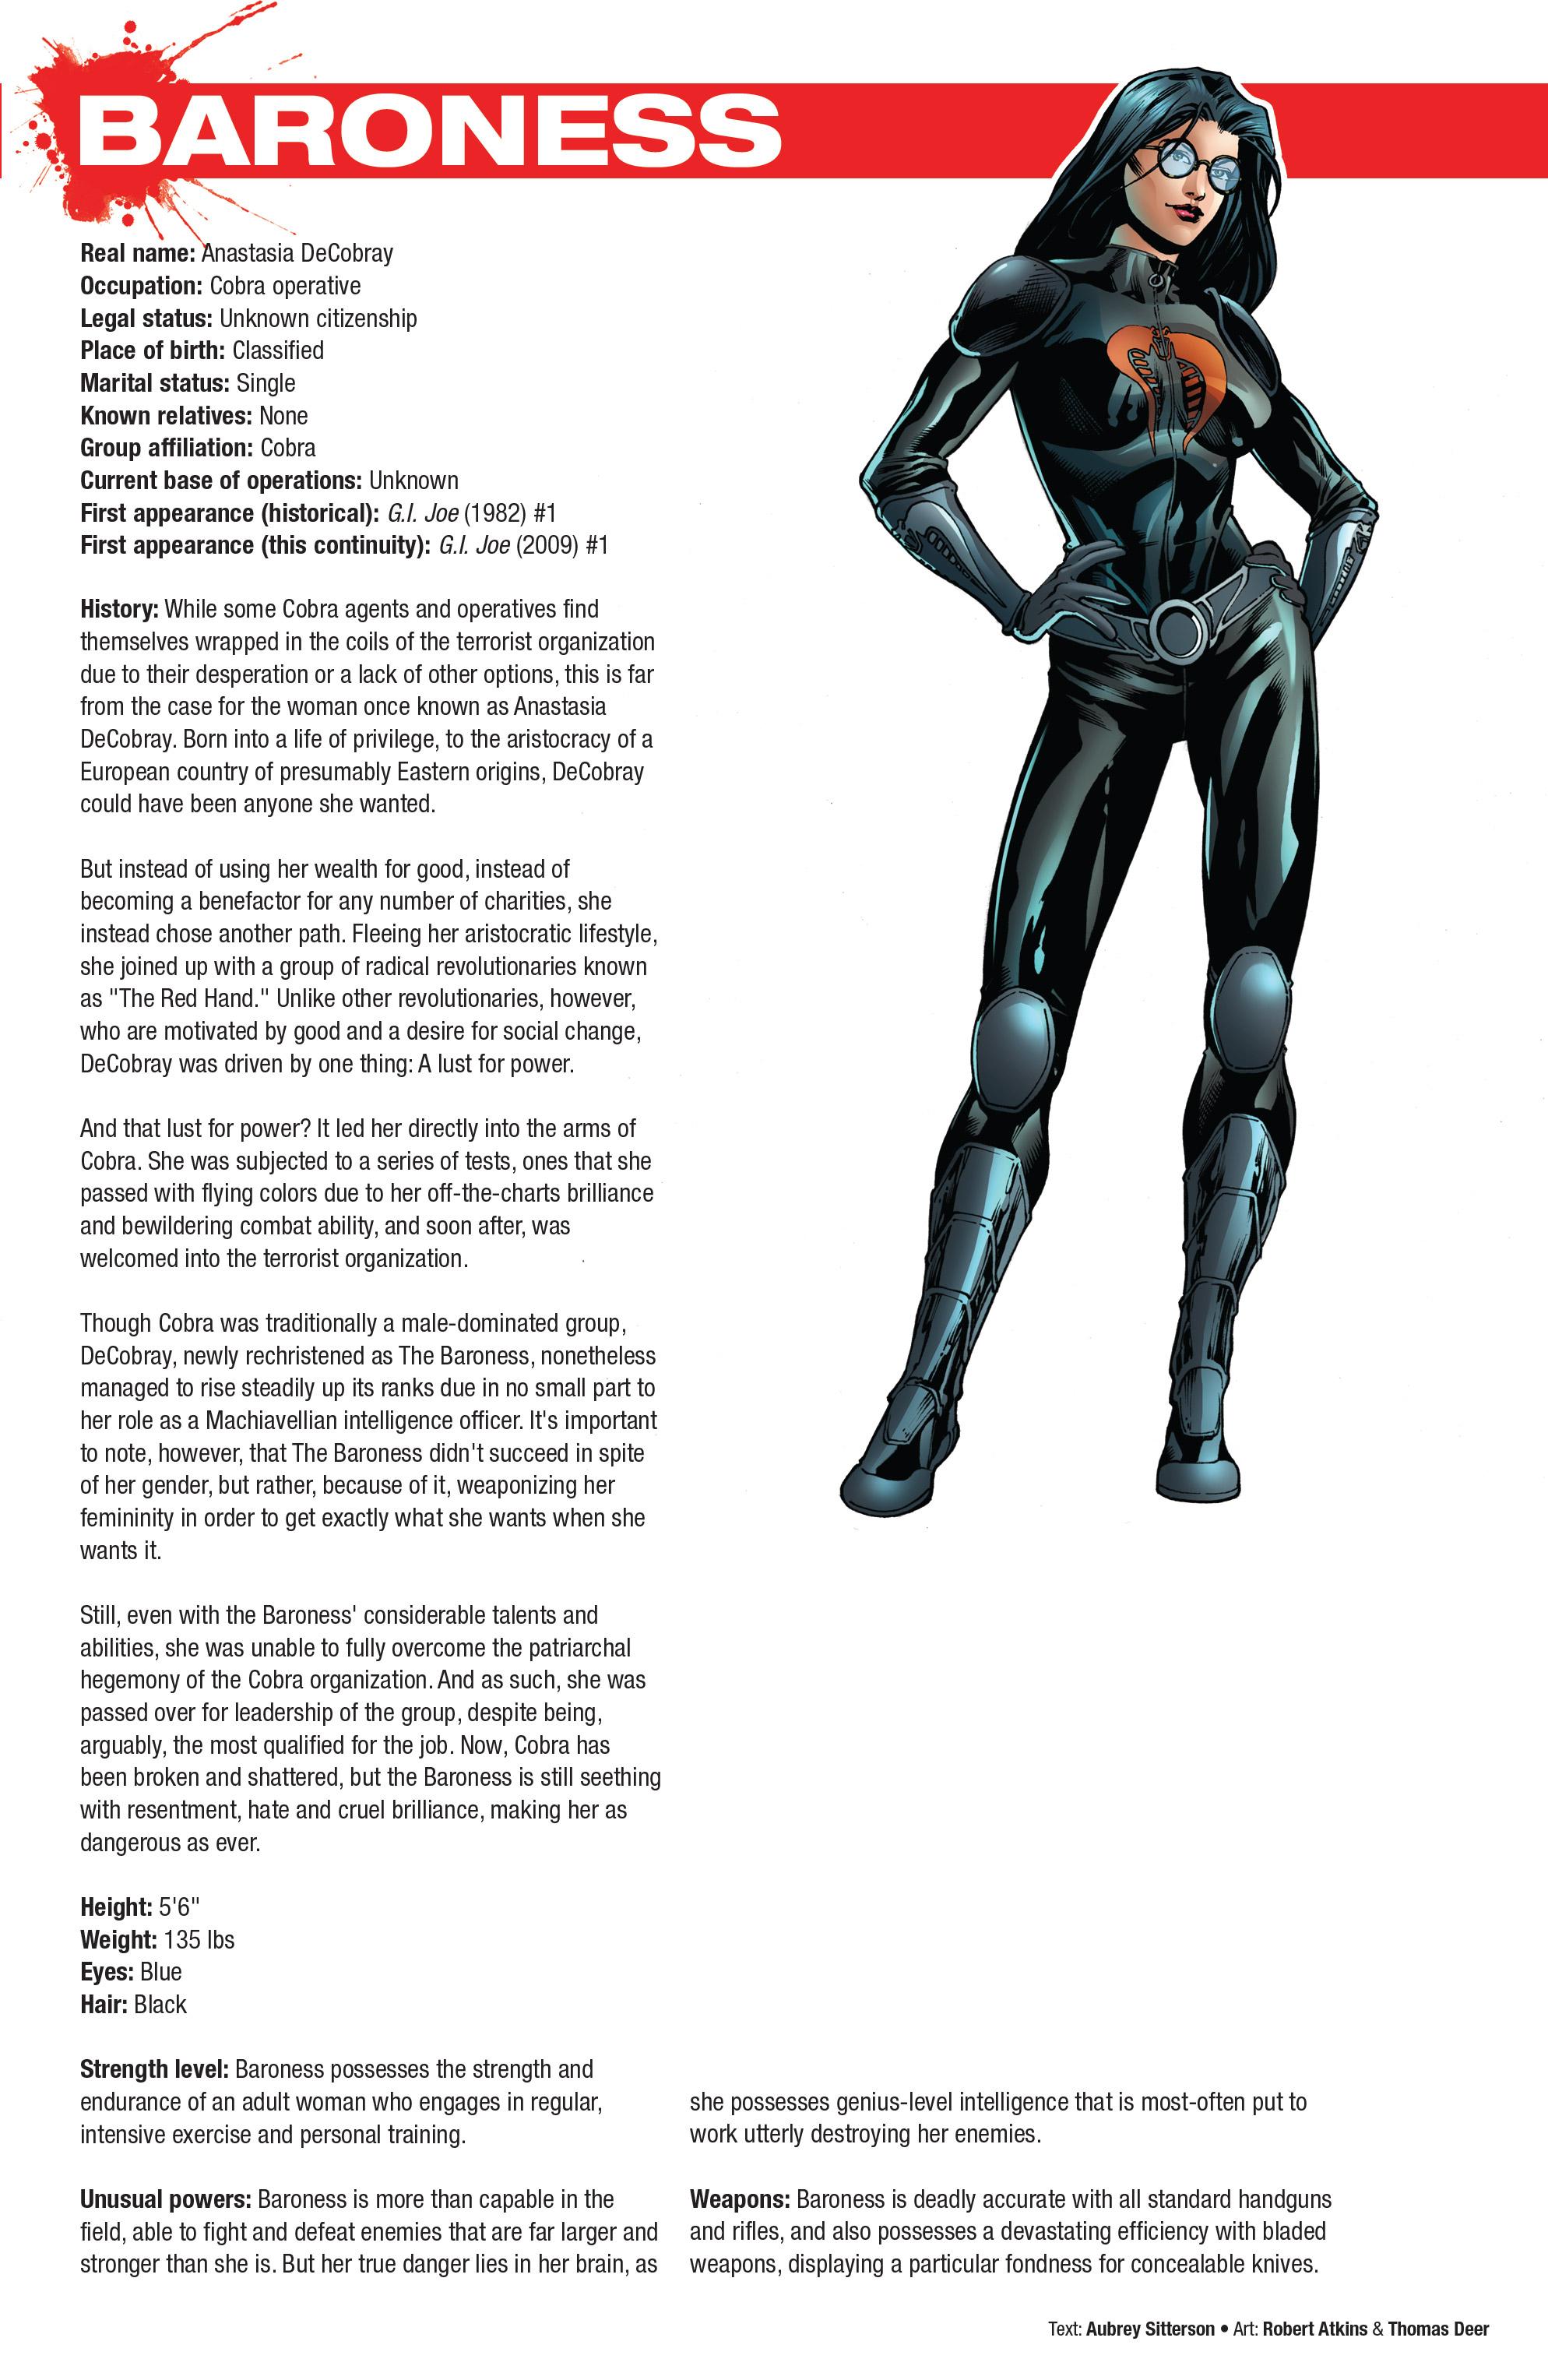 Read online Hasbro Heroes Sourcebook comic -  Issue #1 - 17